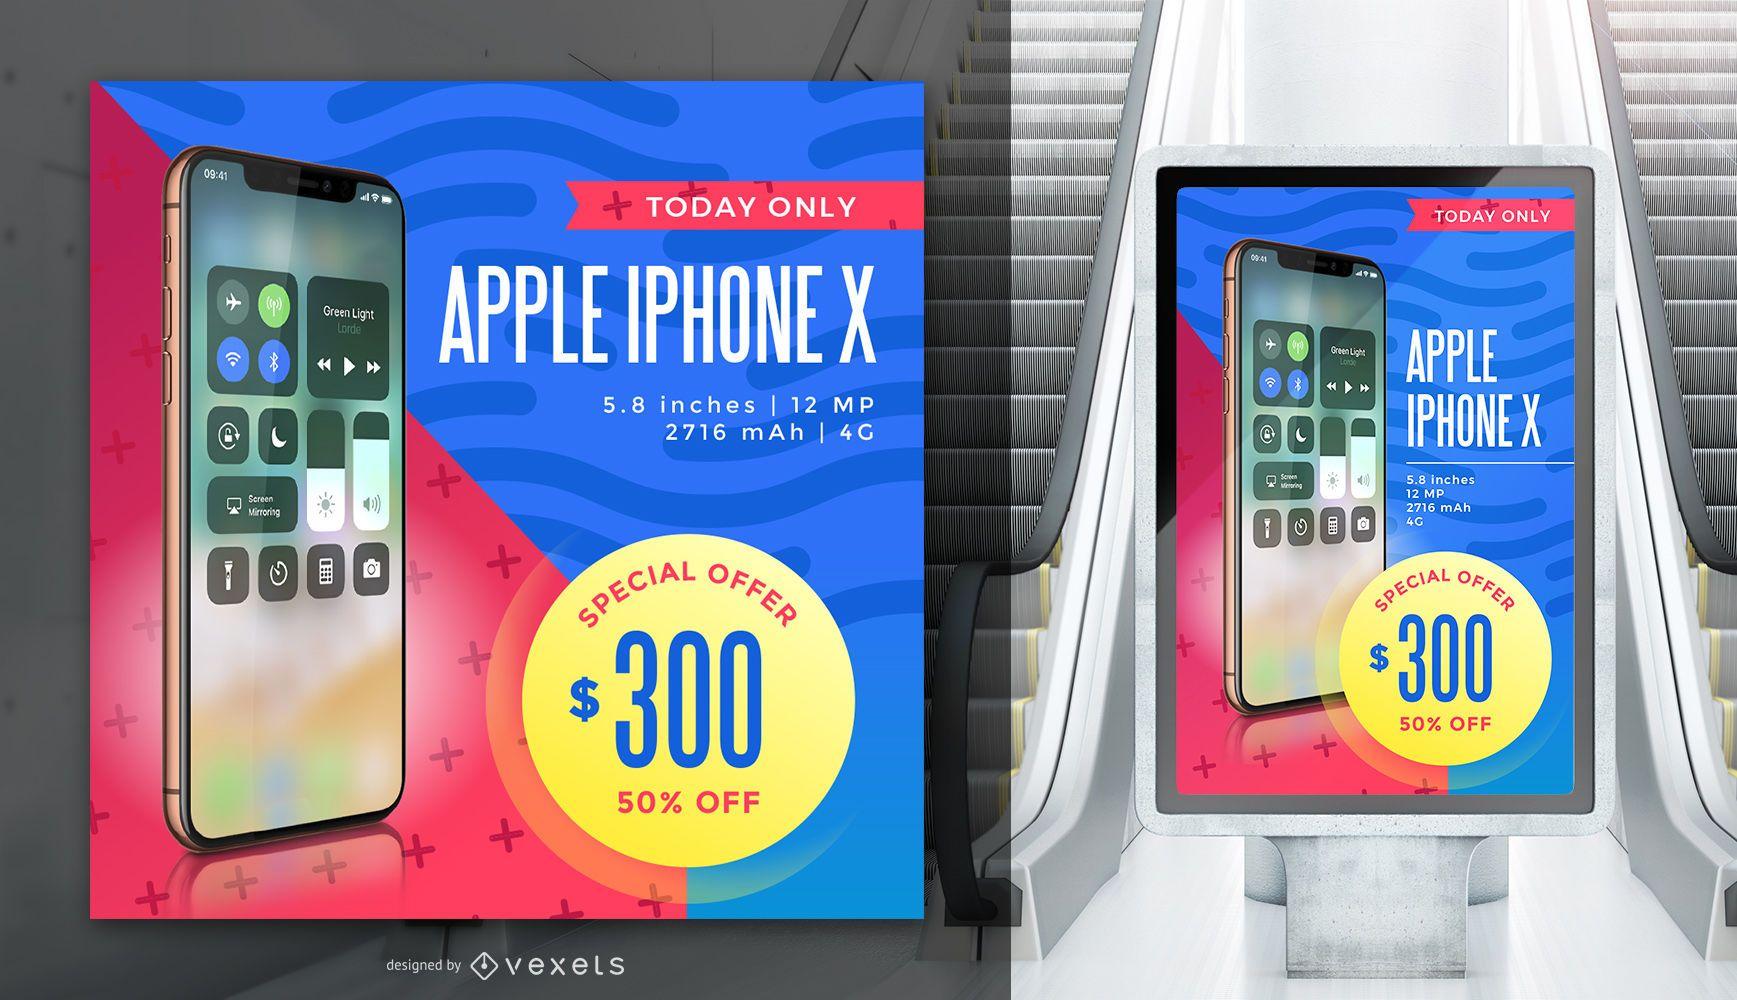 Iphone X advertising banner mockup